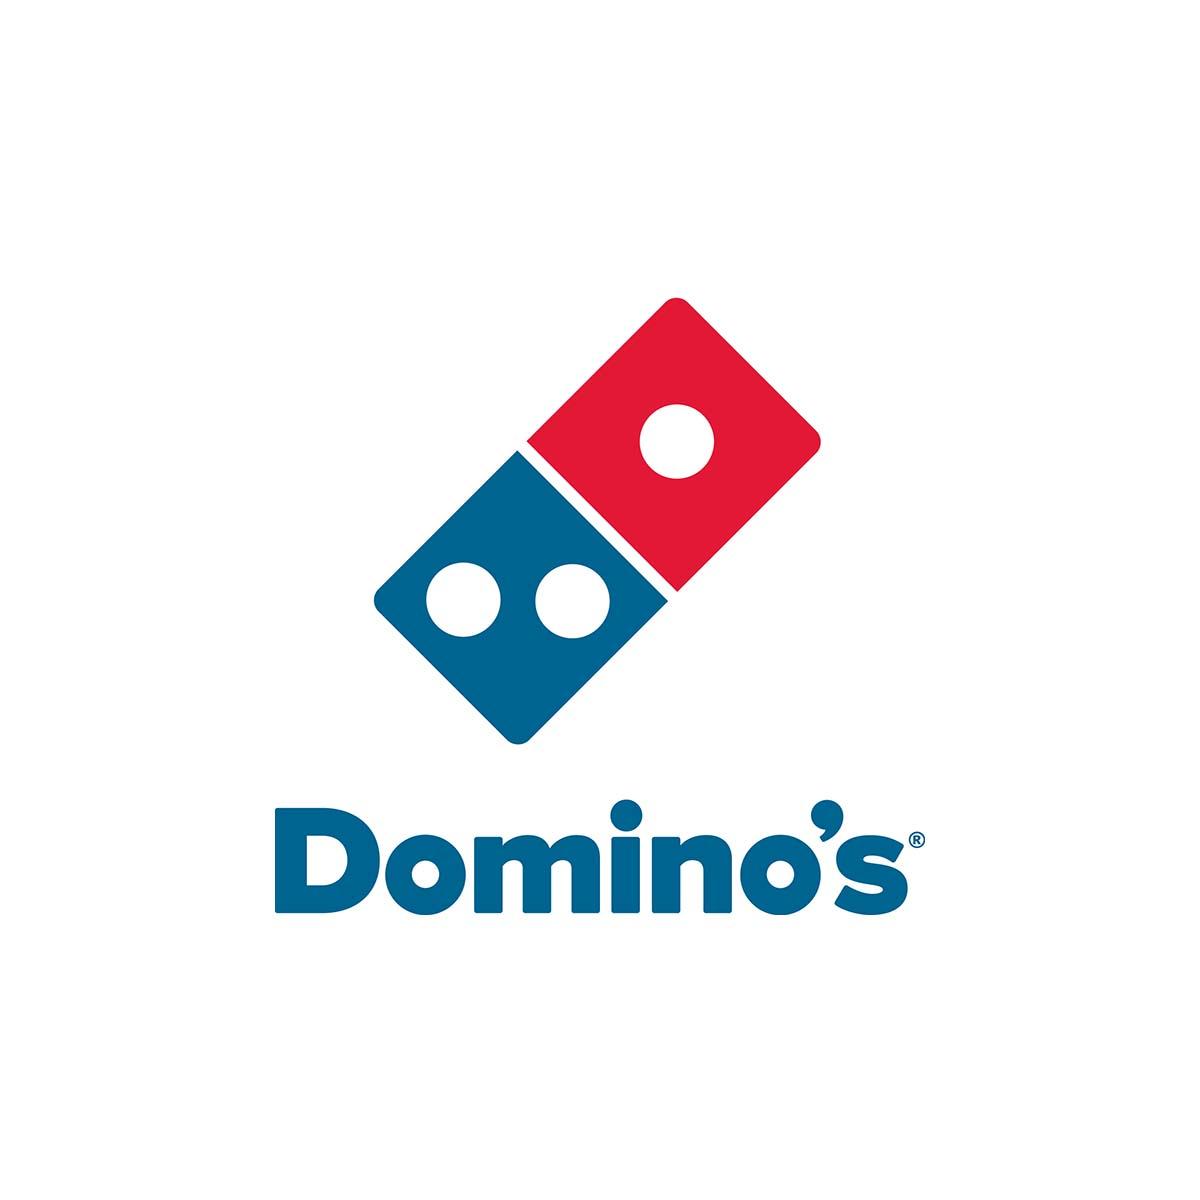 Dominos-contato